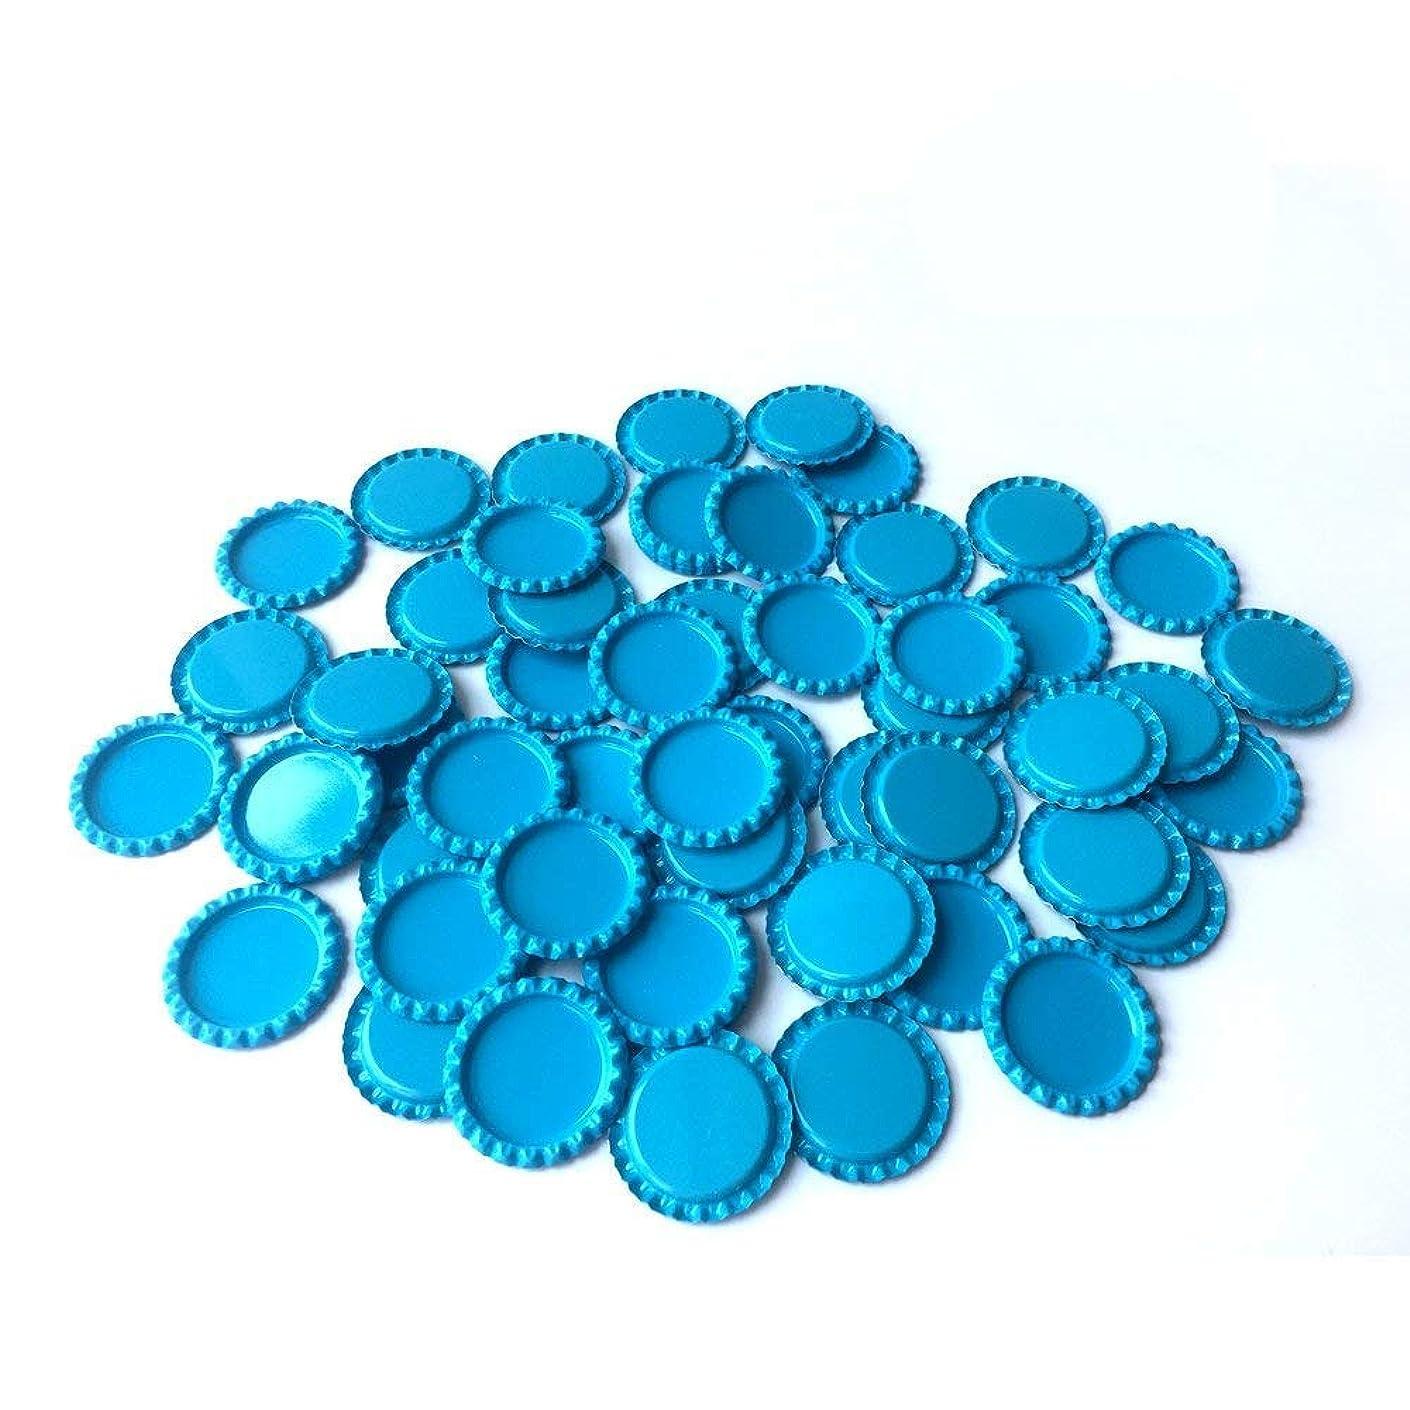 HAWORTHS 100 PCS Flat Decorative Bottle CaP Craft Bottle Stickers Double Sideds Printed for Hair Bows, DIY Pendants or Craft ScraPbooks Light blue